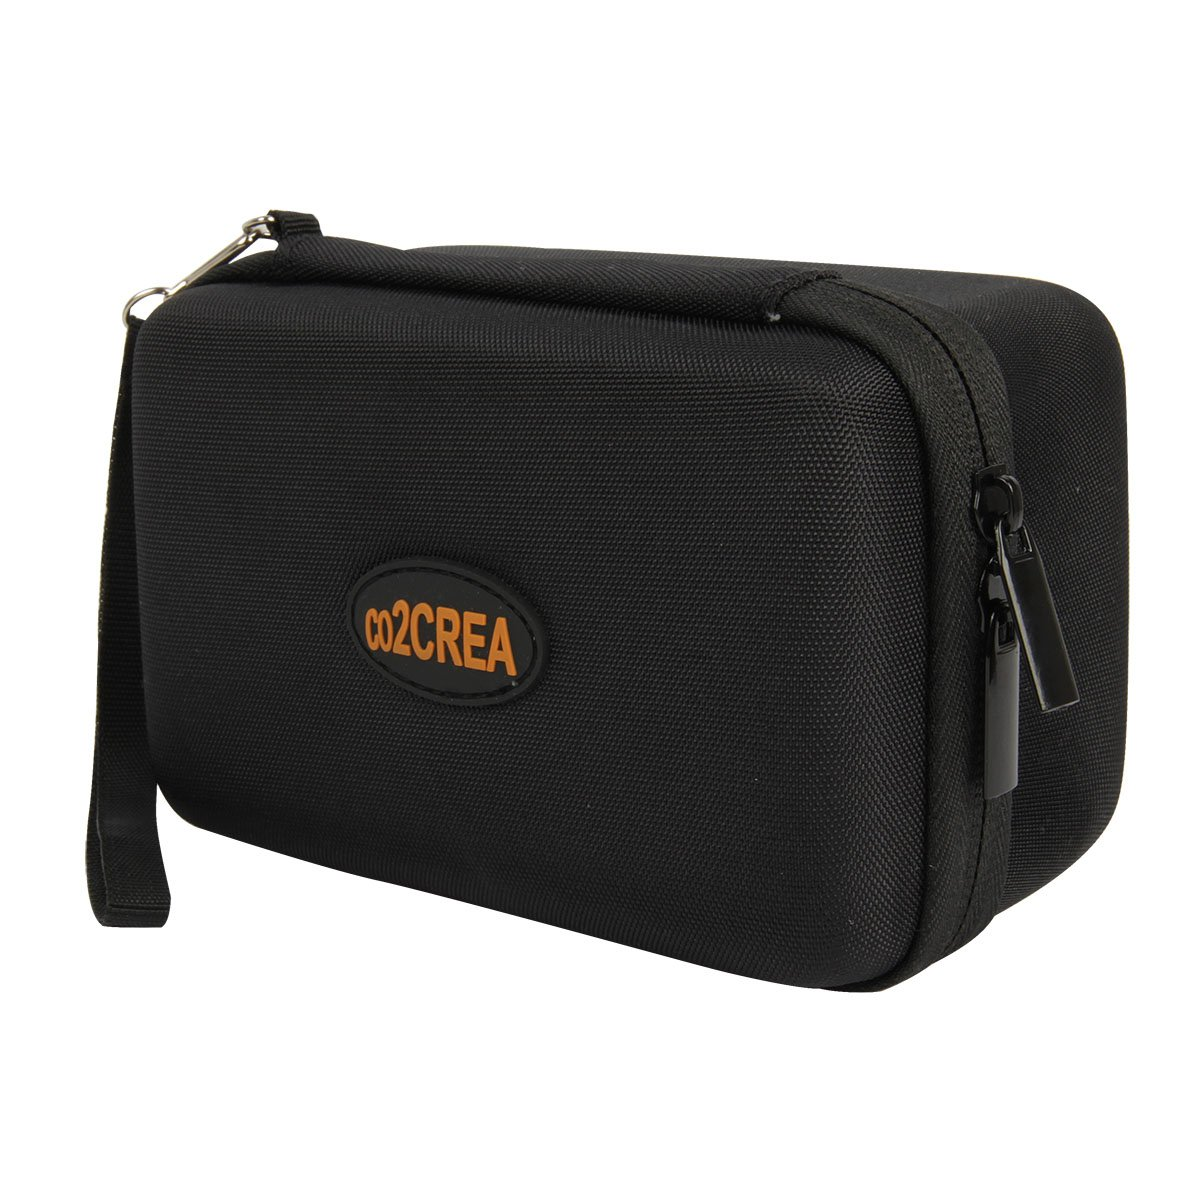 co2CREA EVA Viajar llevar Caja Bolsa Fundas Estuche Bag Case para All 5-inch,